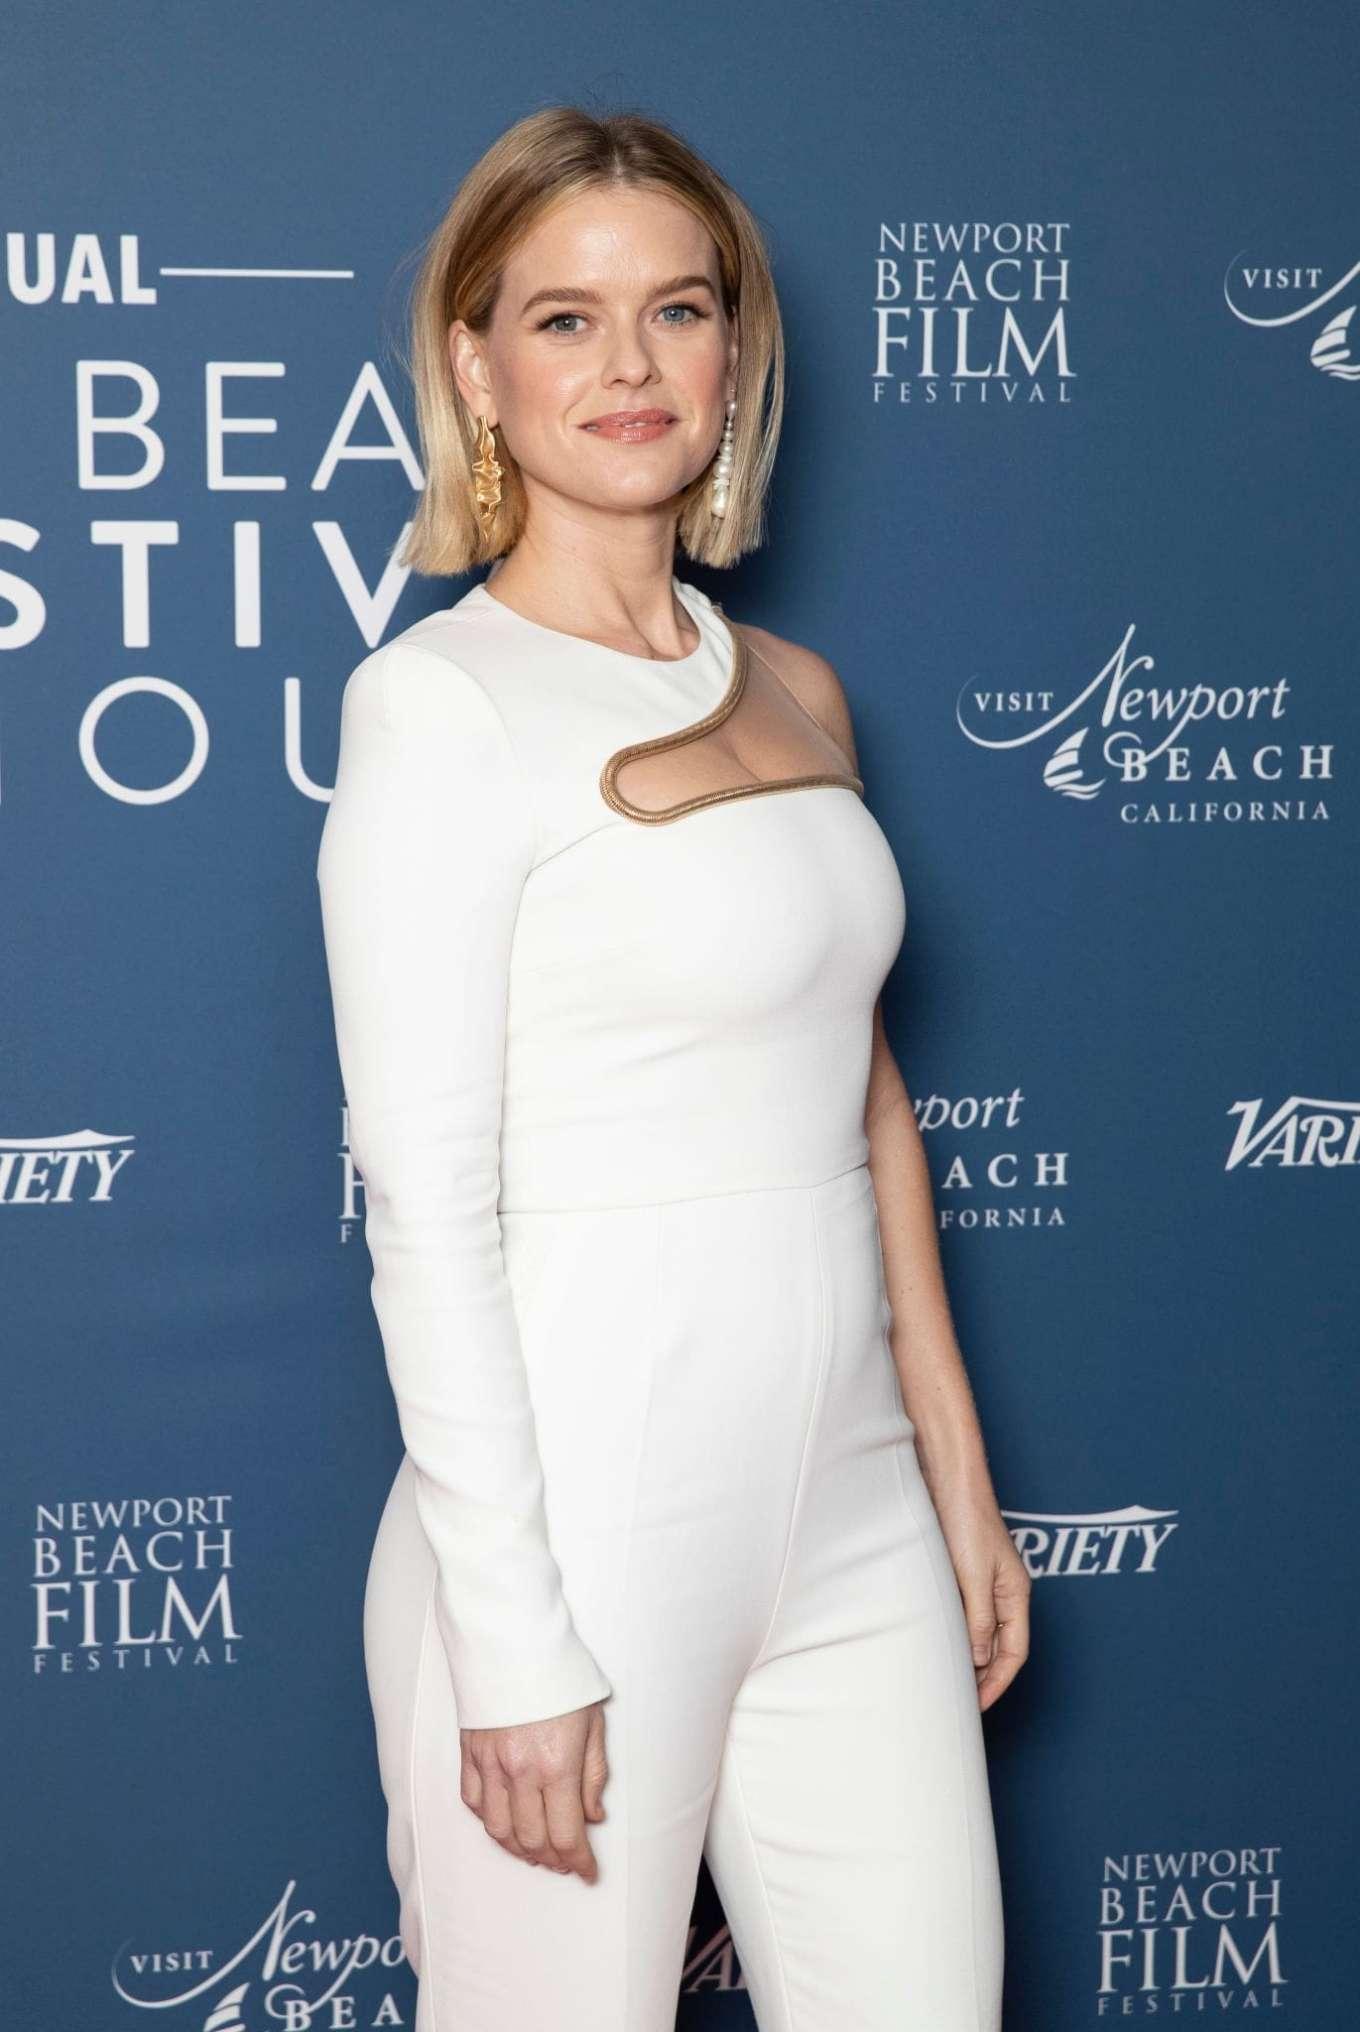 Alice Eve 2020 : Alice Eve – Newport Beach Film Festival 6th Annual UK Honours-17